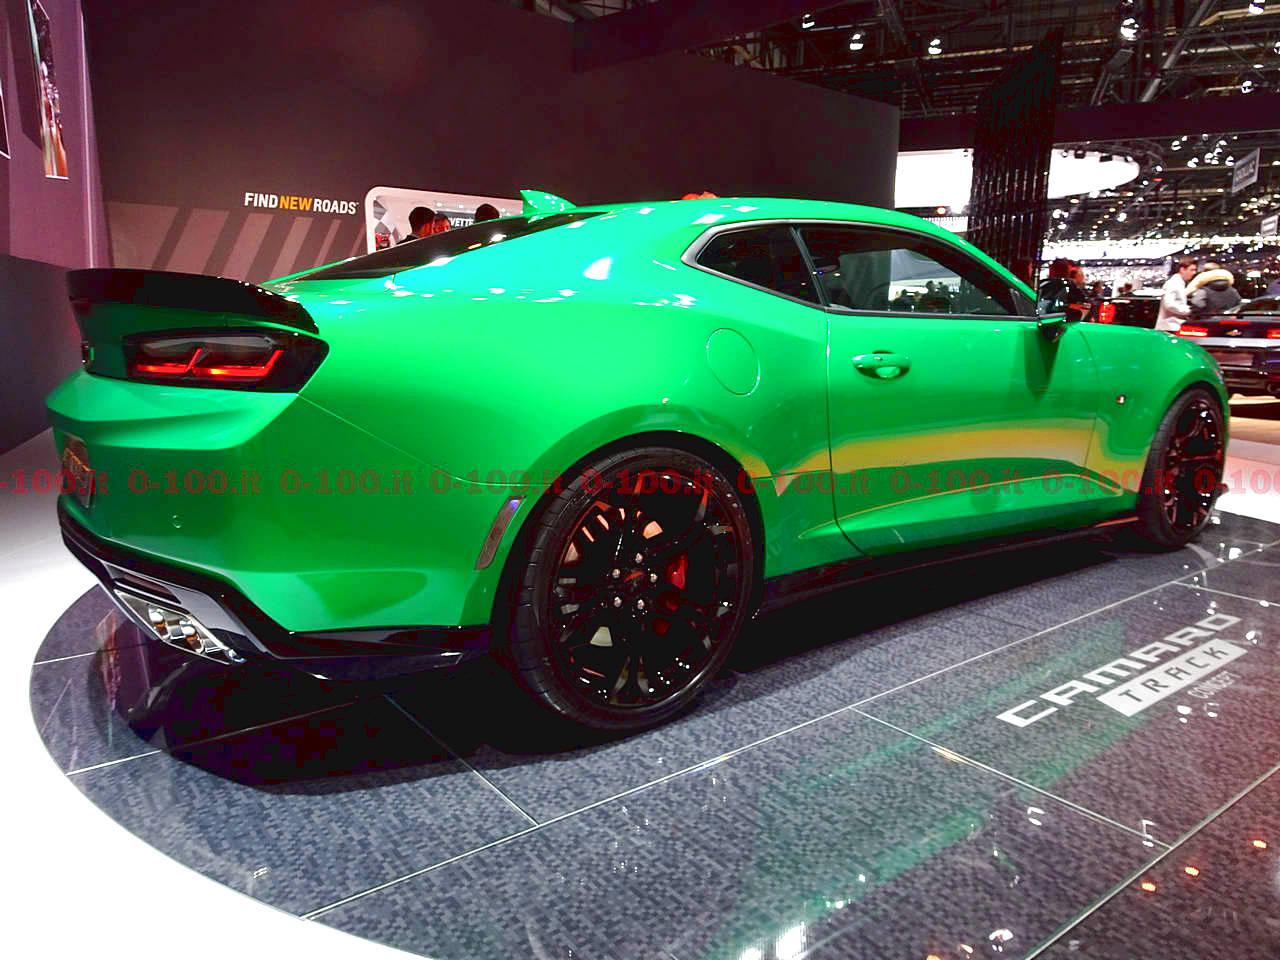 Ginevra-geneva-geneve-2017-Chevrolet-Camaro-Track-Concept-0-100_11